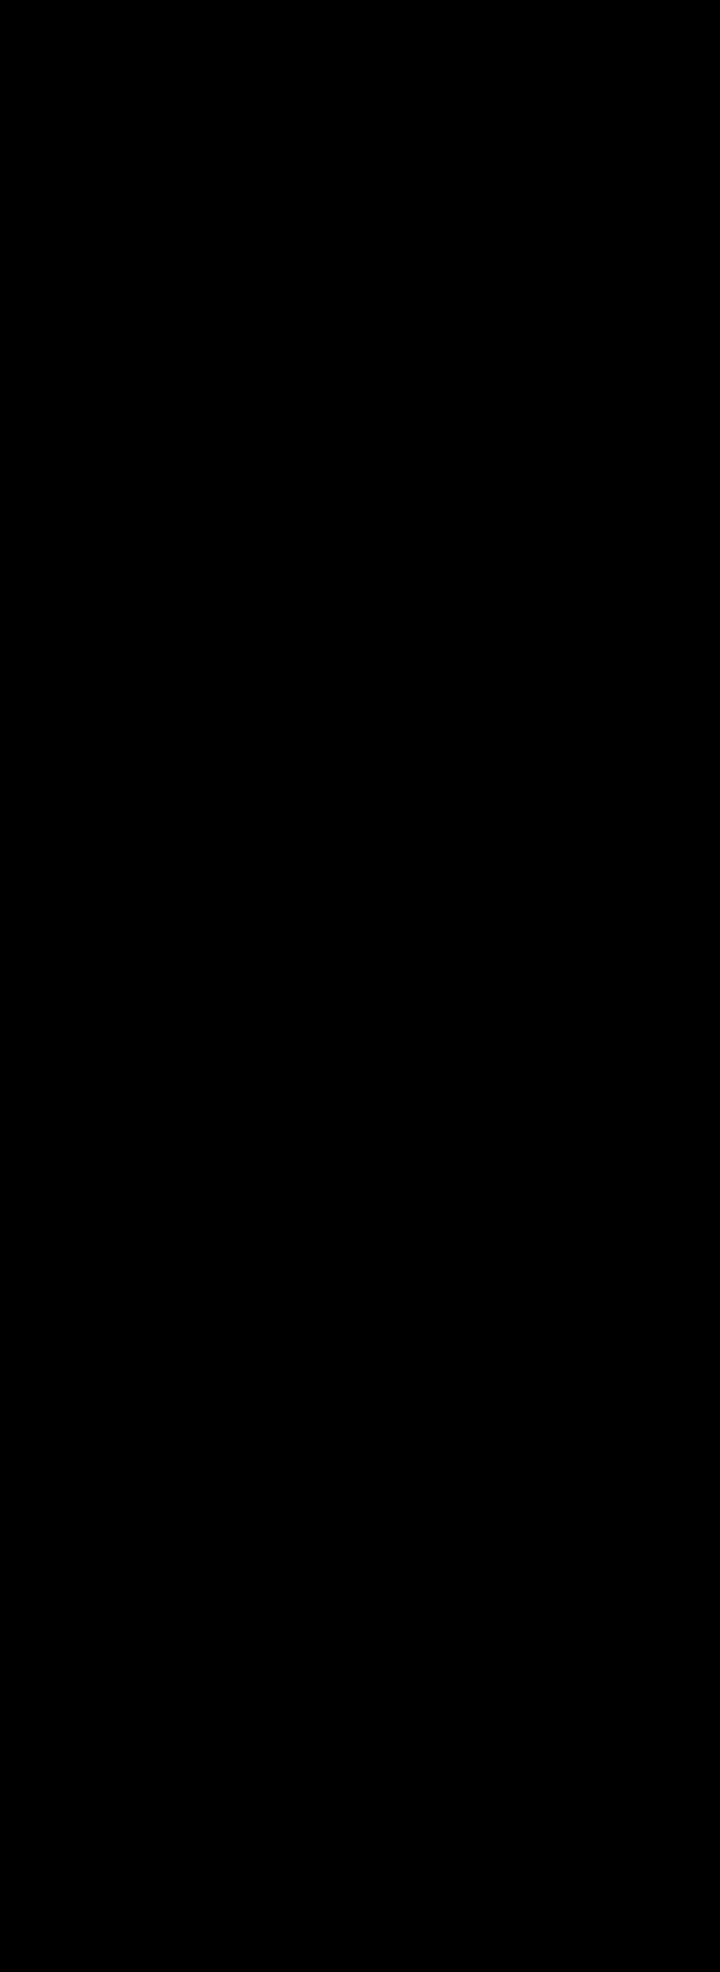 Kate Greenaways Alphabet Font Phrases